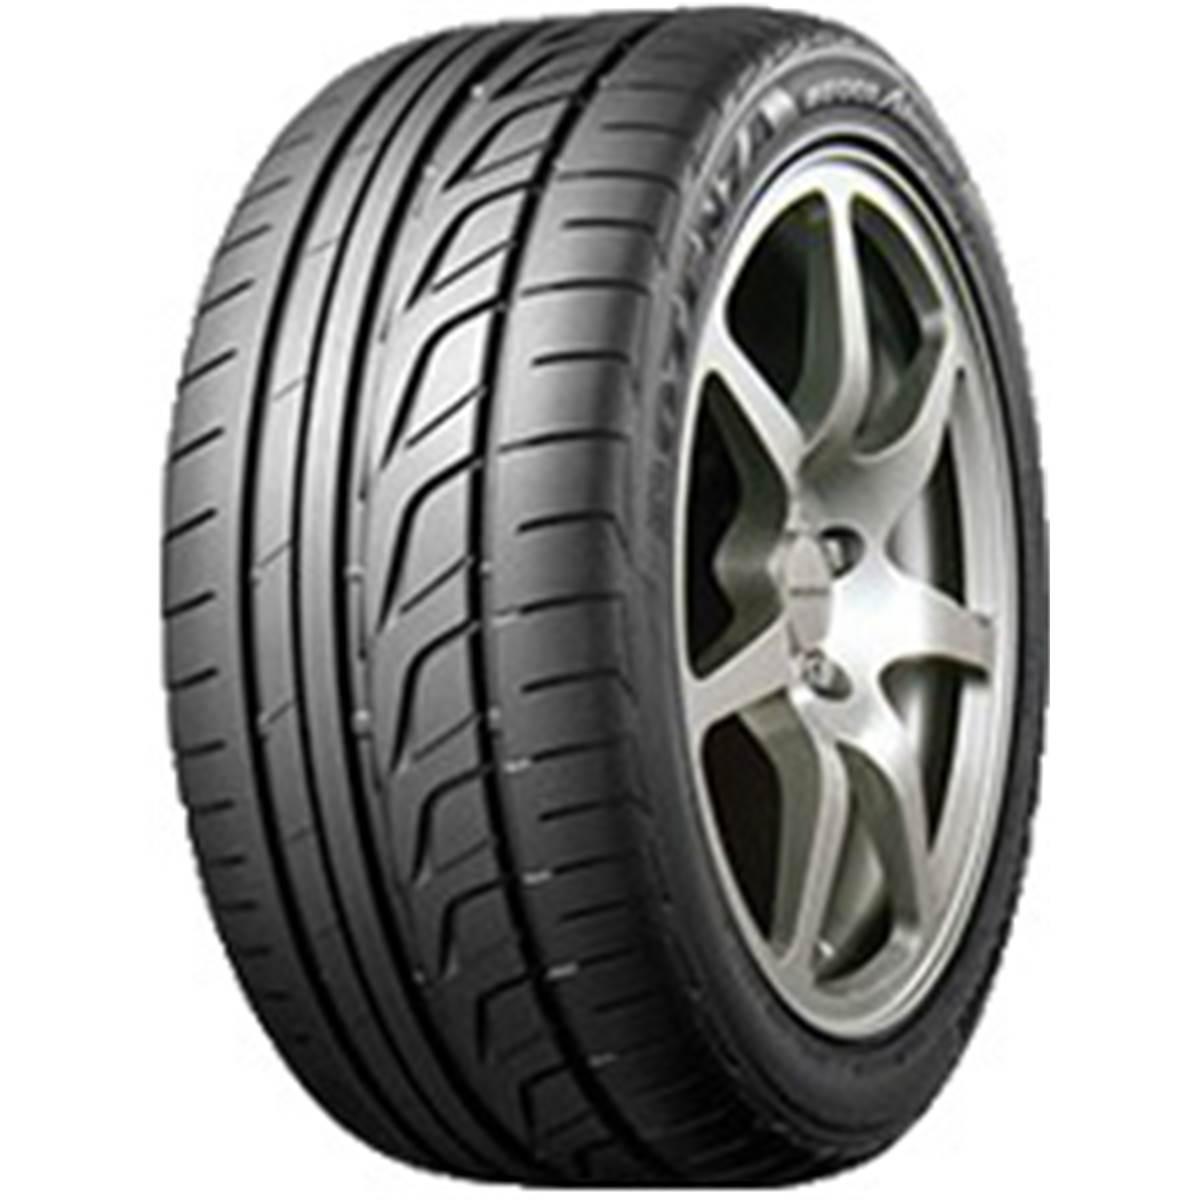 Pneu Bridgestone 215/55R17 94W POTENZA ADRENALIN RE002